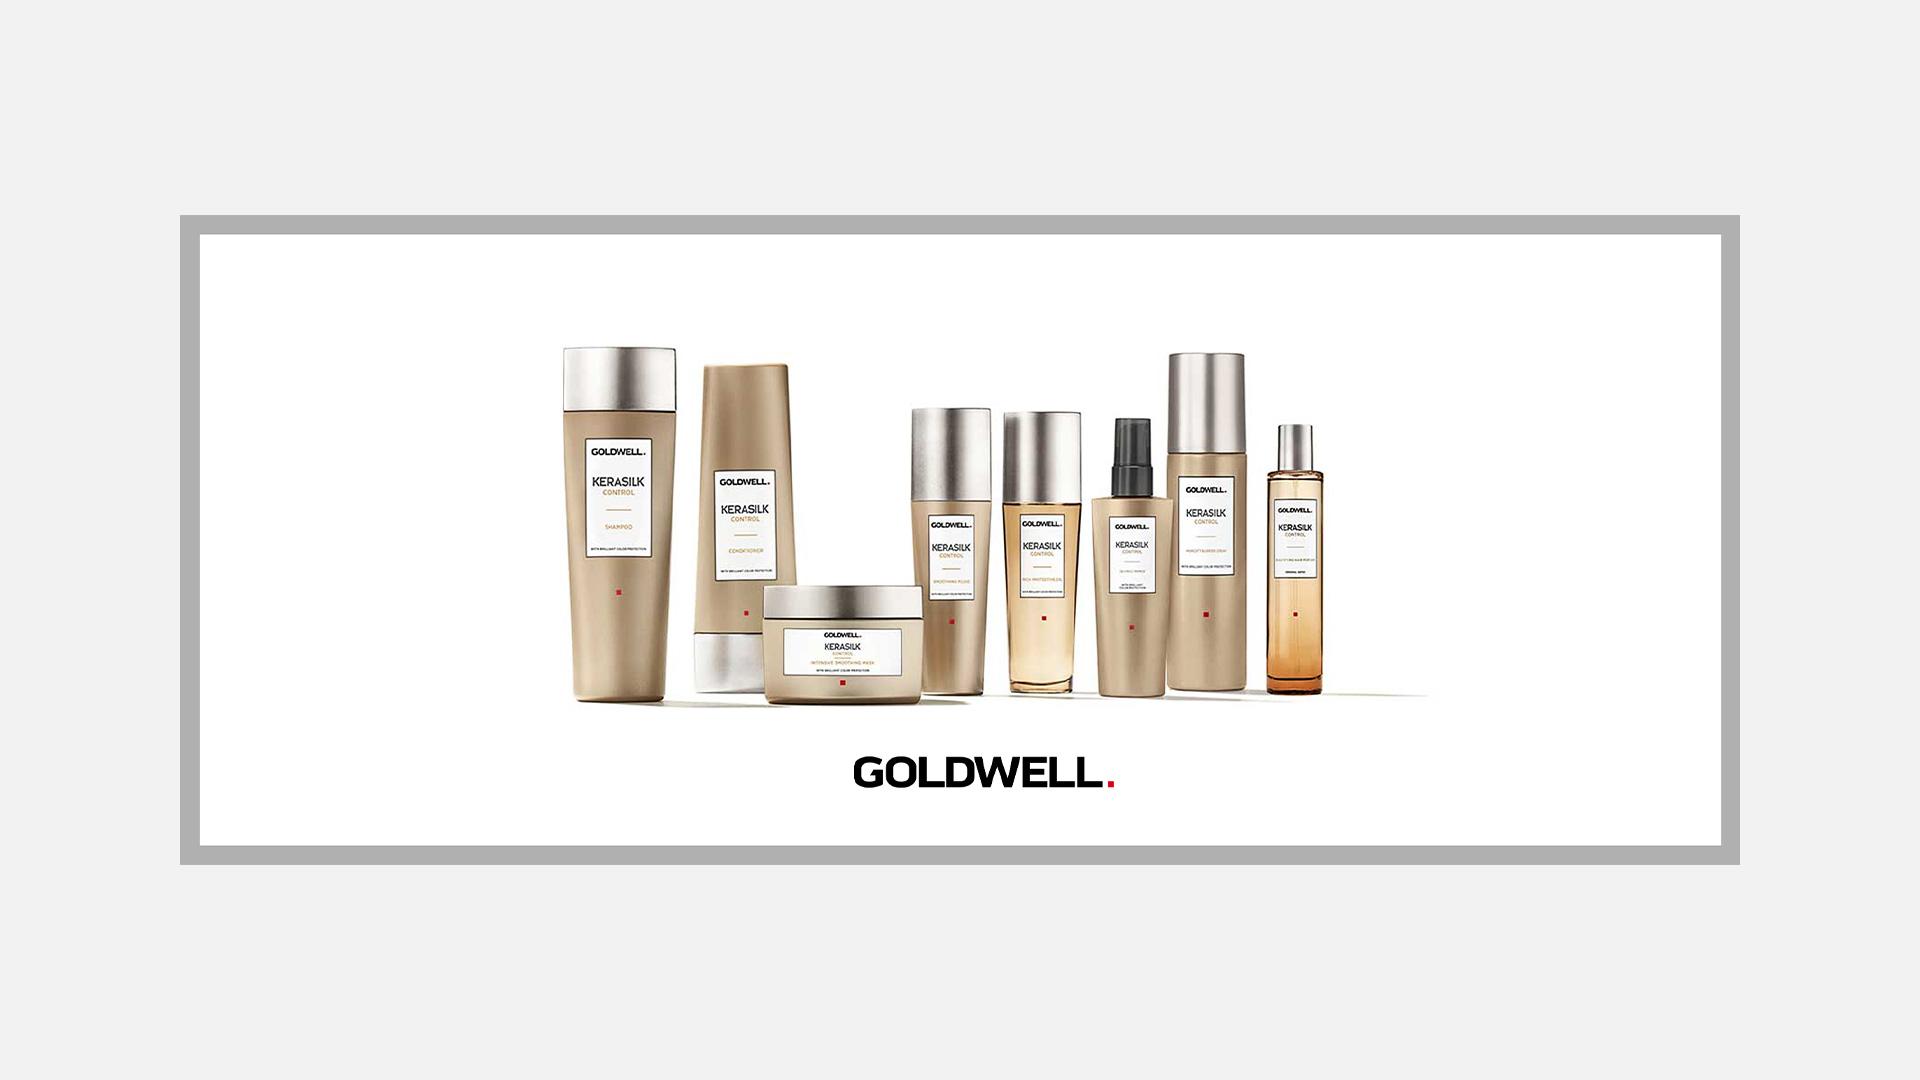 11-goldwell